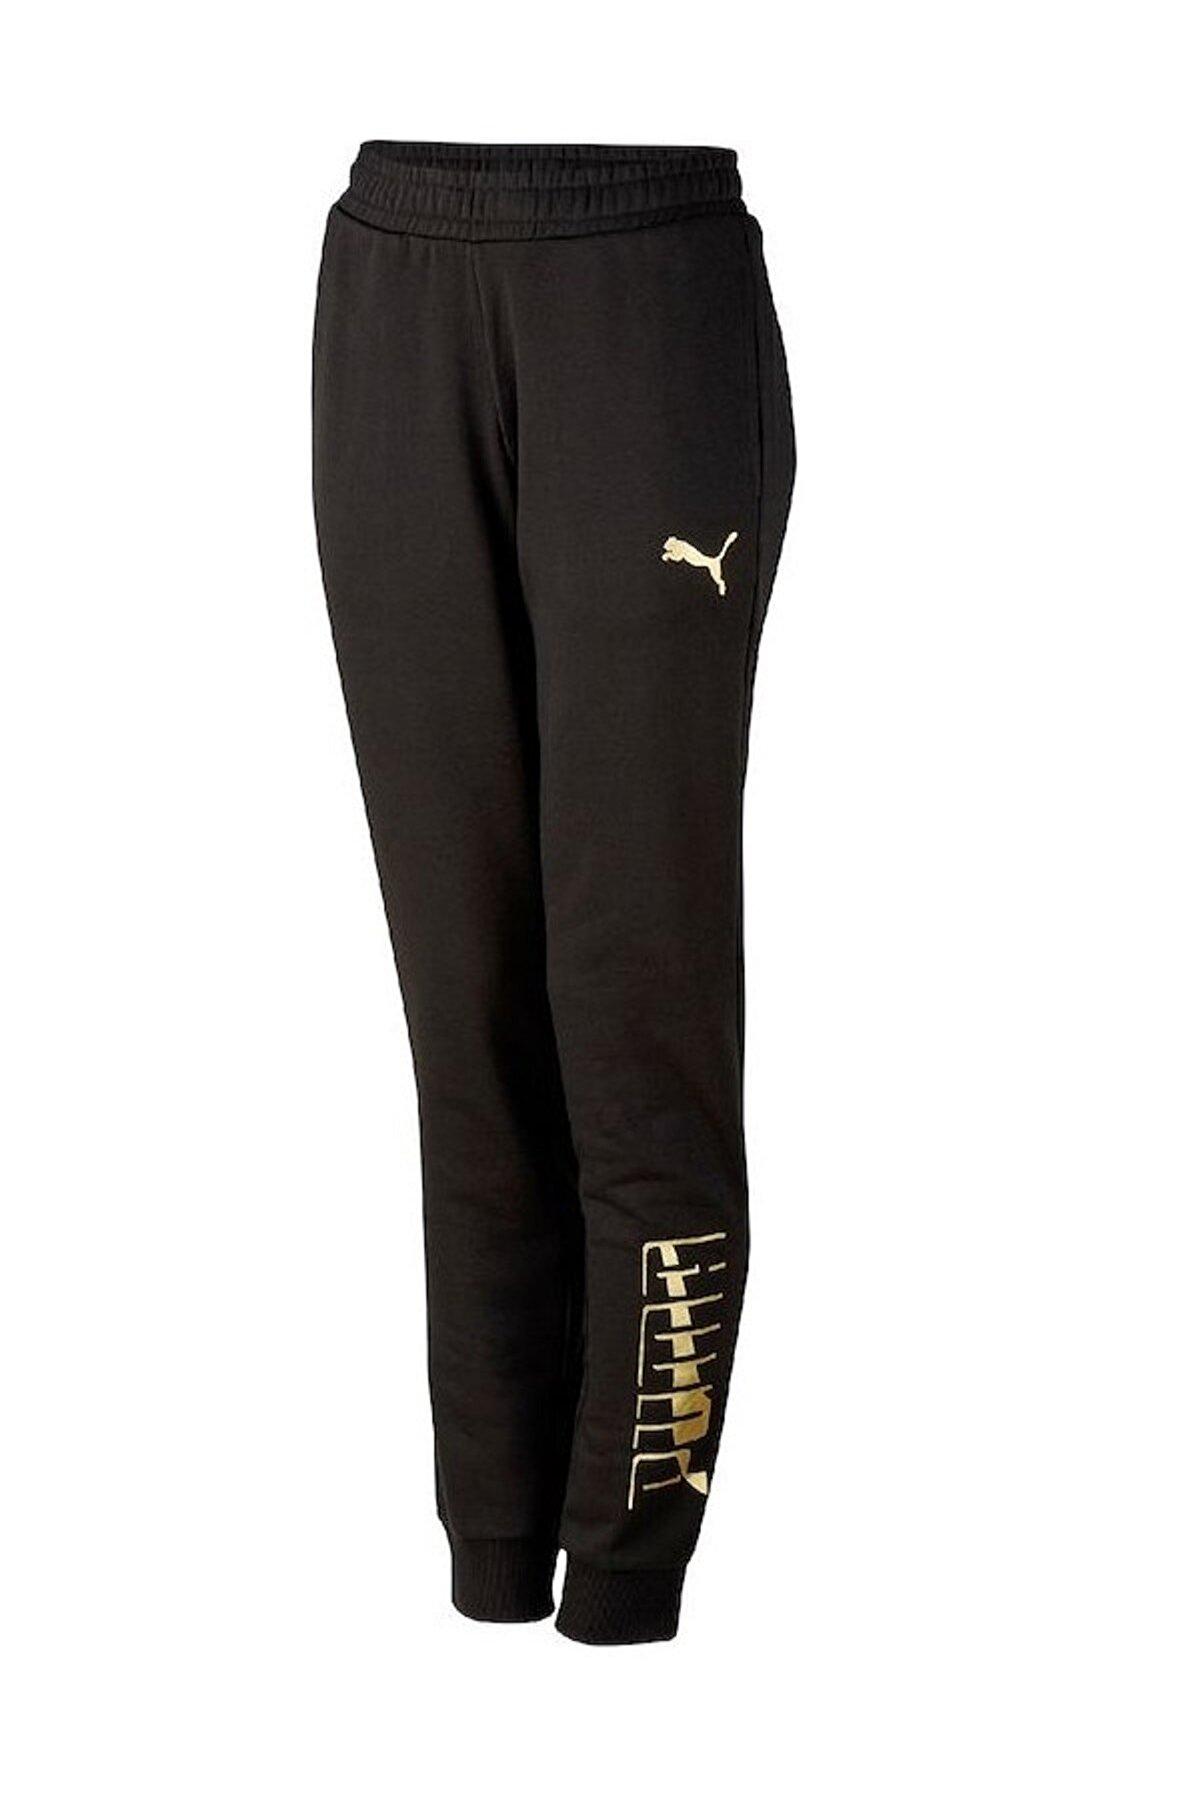 Puma Kadın Spor Eşofman Altı - Pants FL II - 58488301